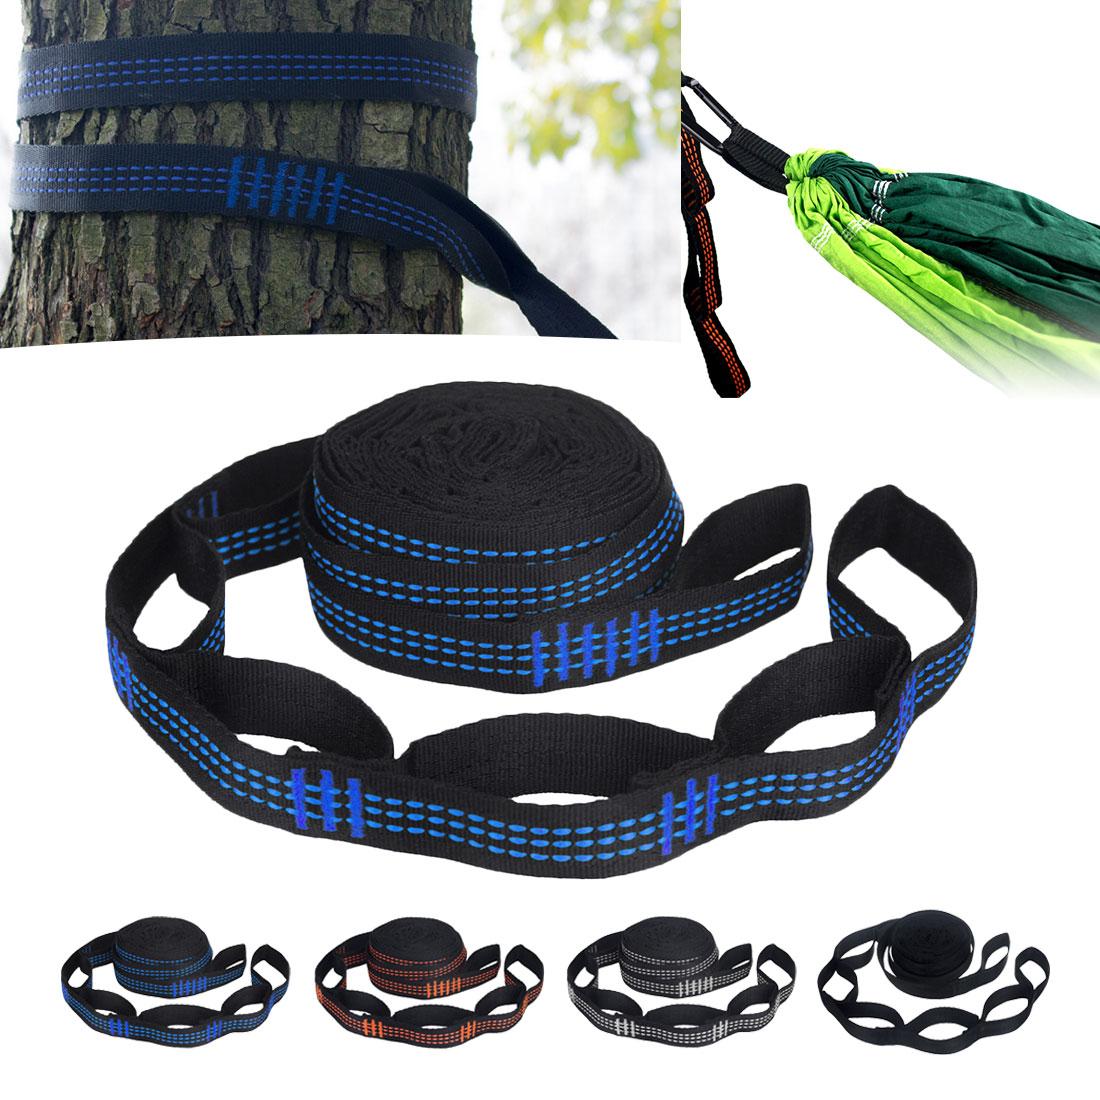 Vitorhytech Adjustable Hammock Strap Hanging Aerial Spare Part Hammock Belt Outdoor Yoga Camping Hammock With Buckle Rope